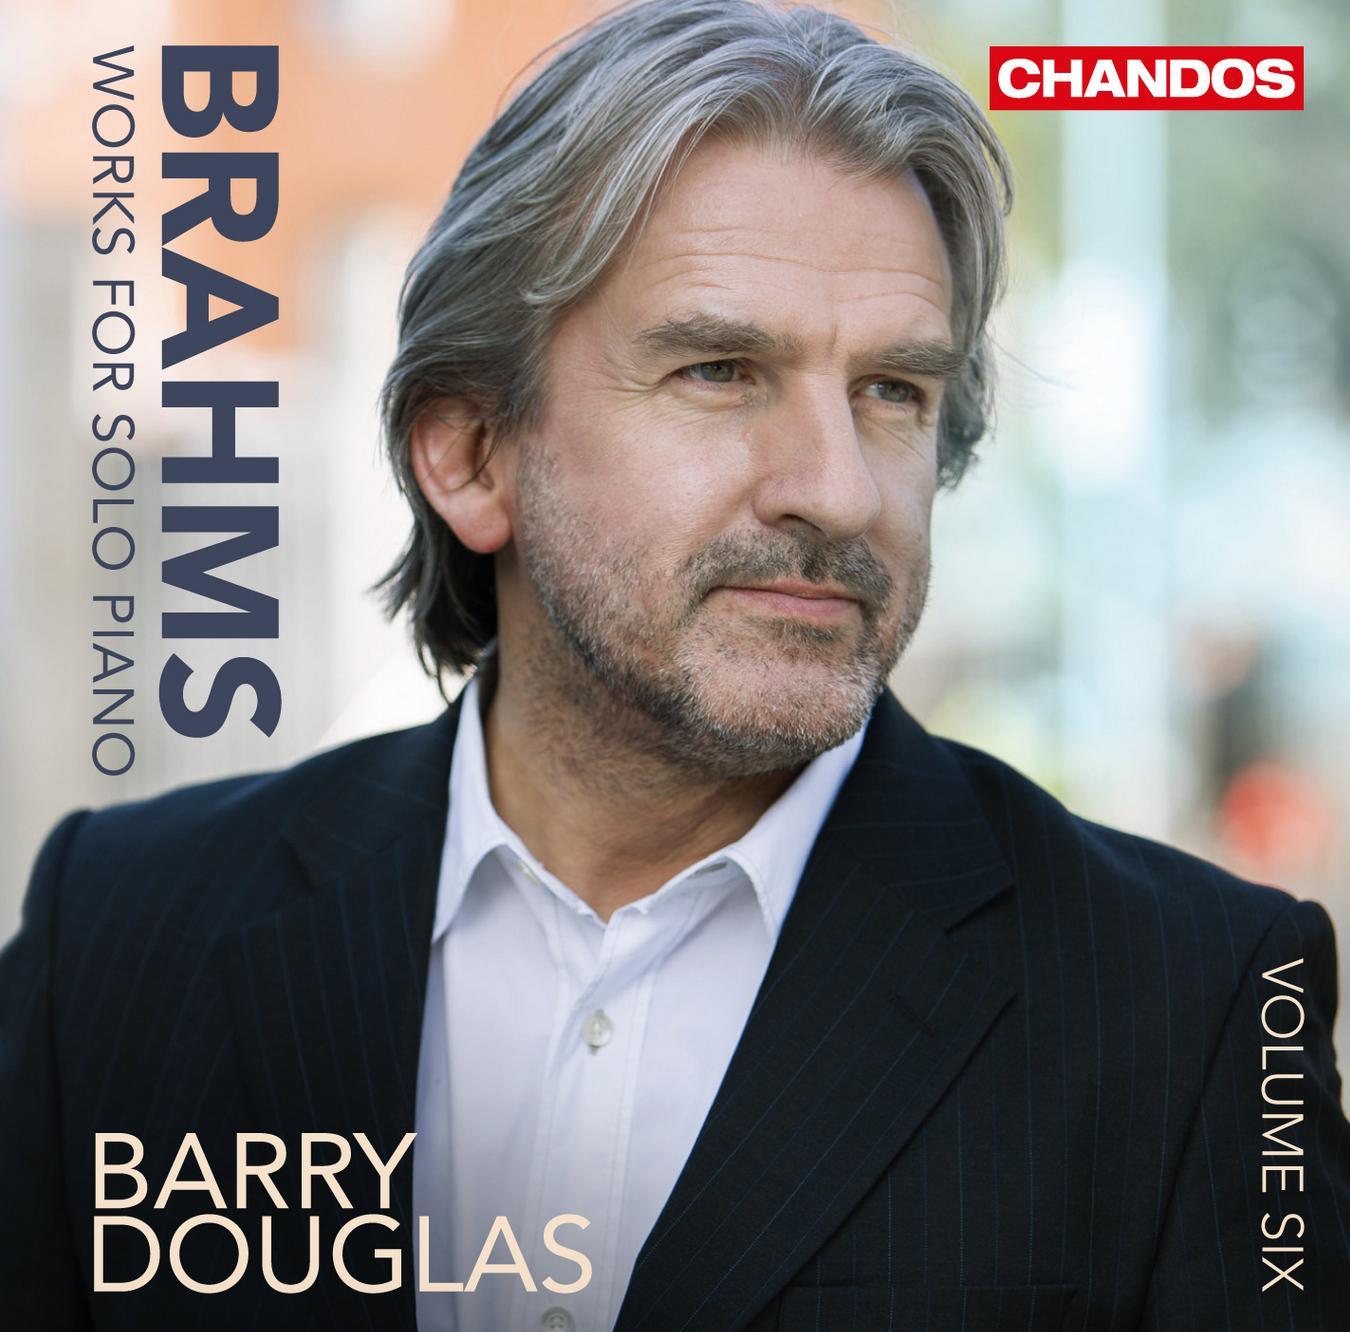 Brahms Barry Douglas